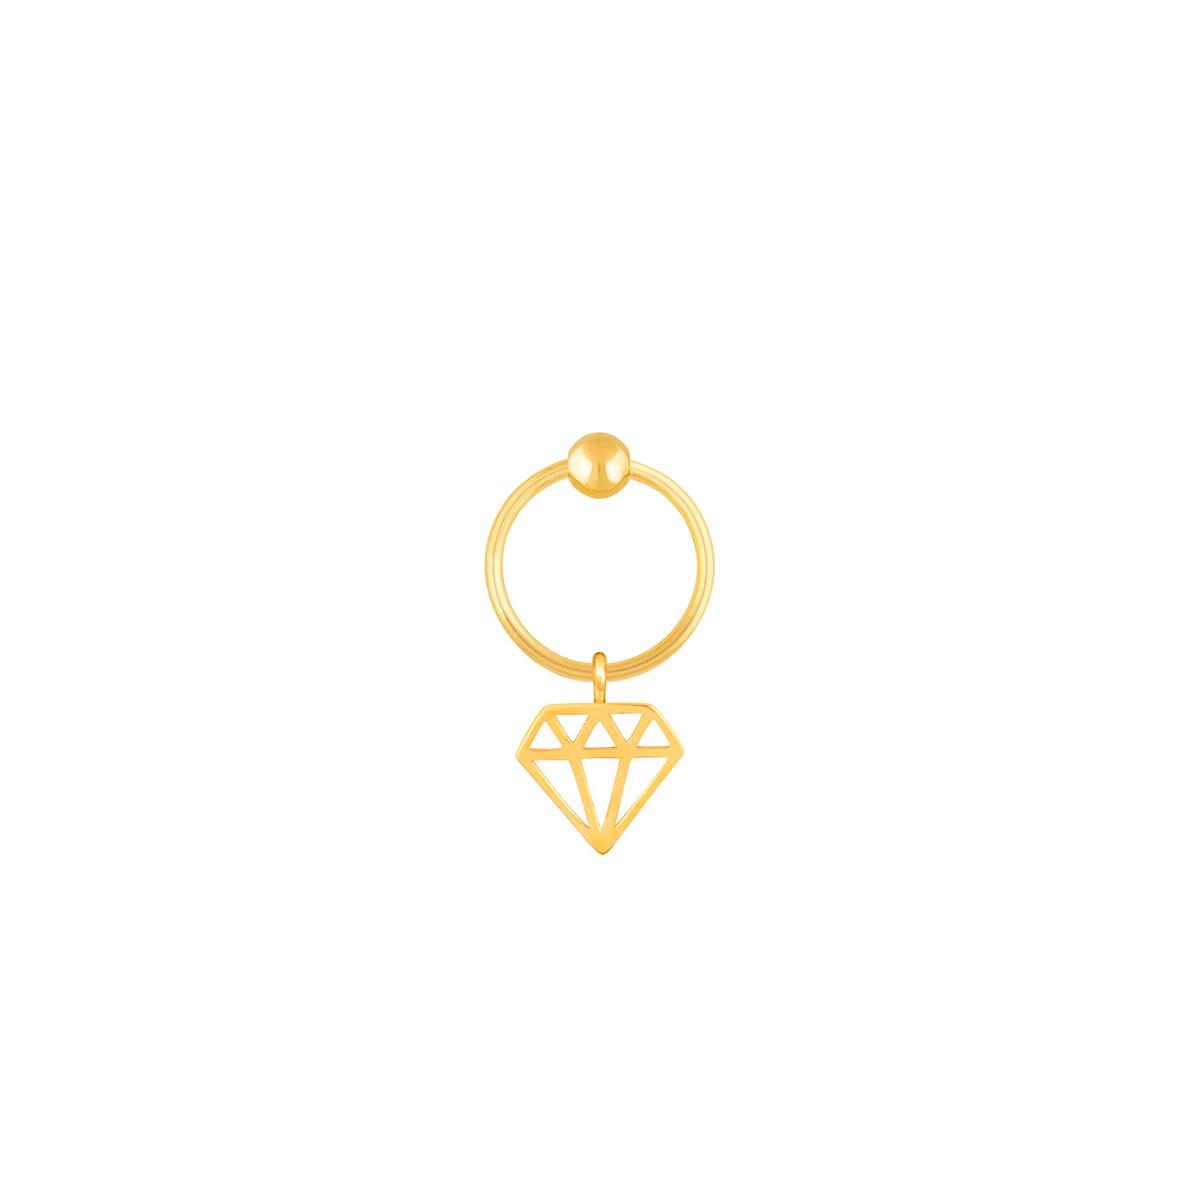 گوشواره طلا تک لنگه ای الماس و گوی